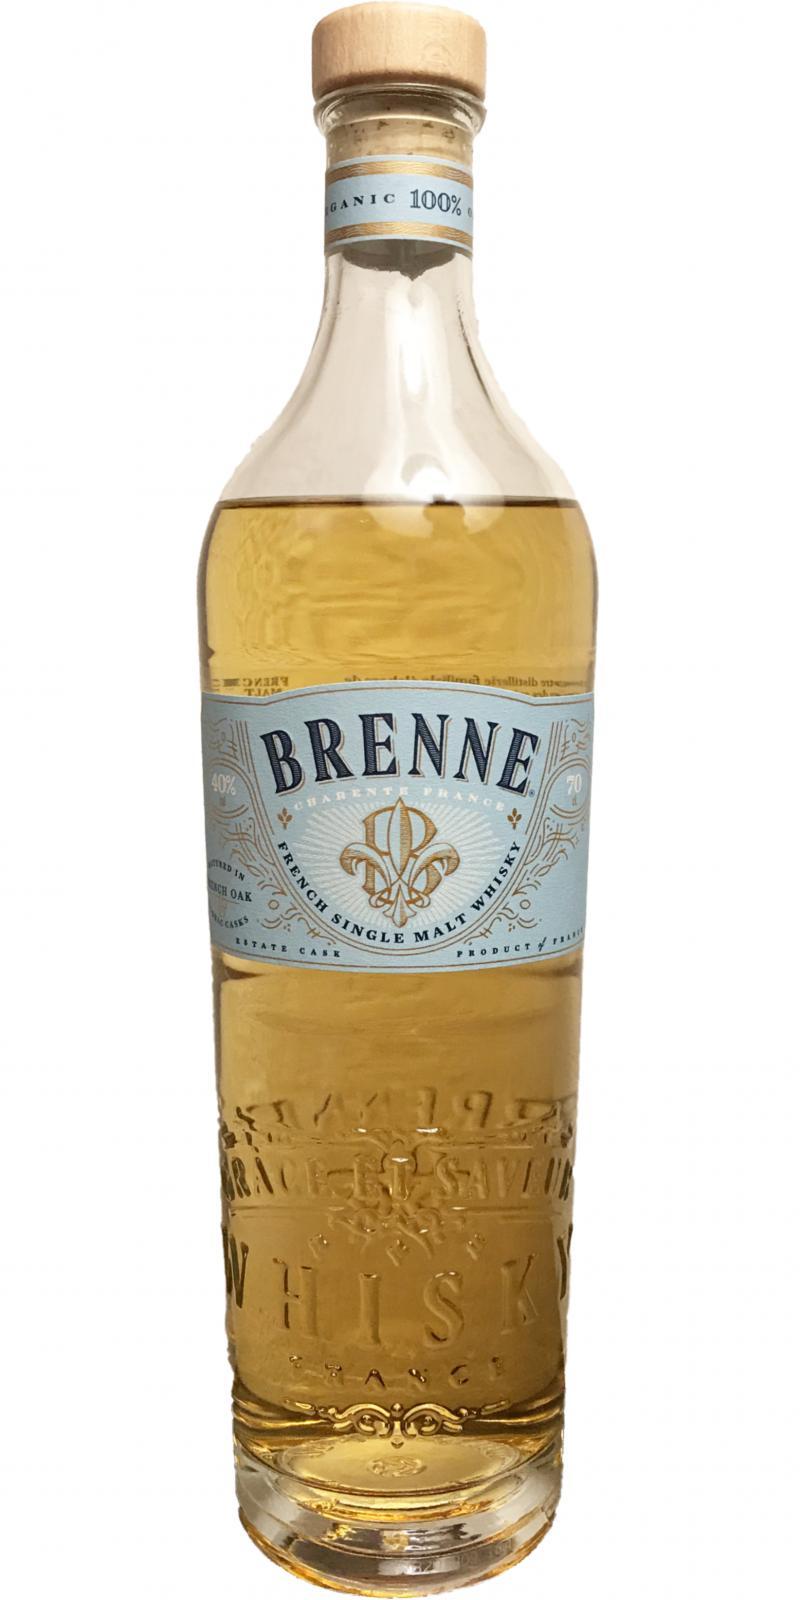 Brenne Organic